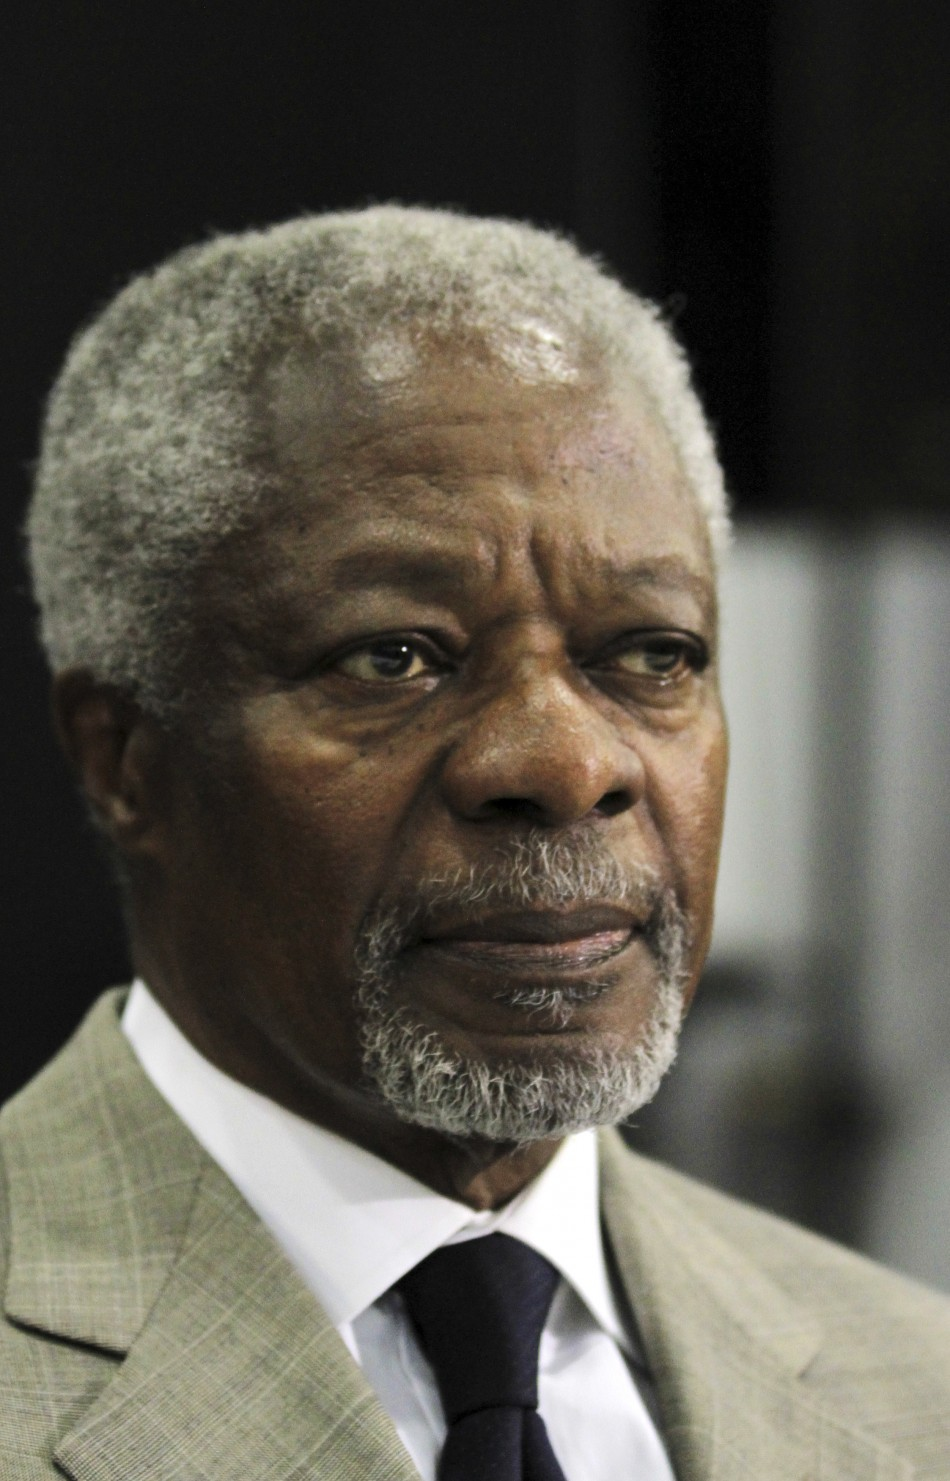 Former UN secretary-general Kofi Annan to serve as special envoy on Syrian crsis